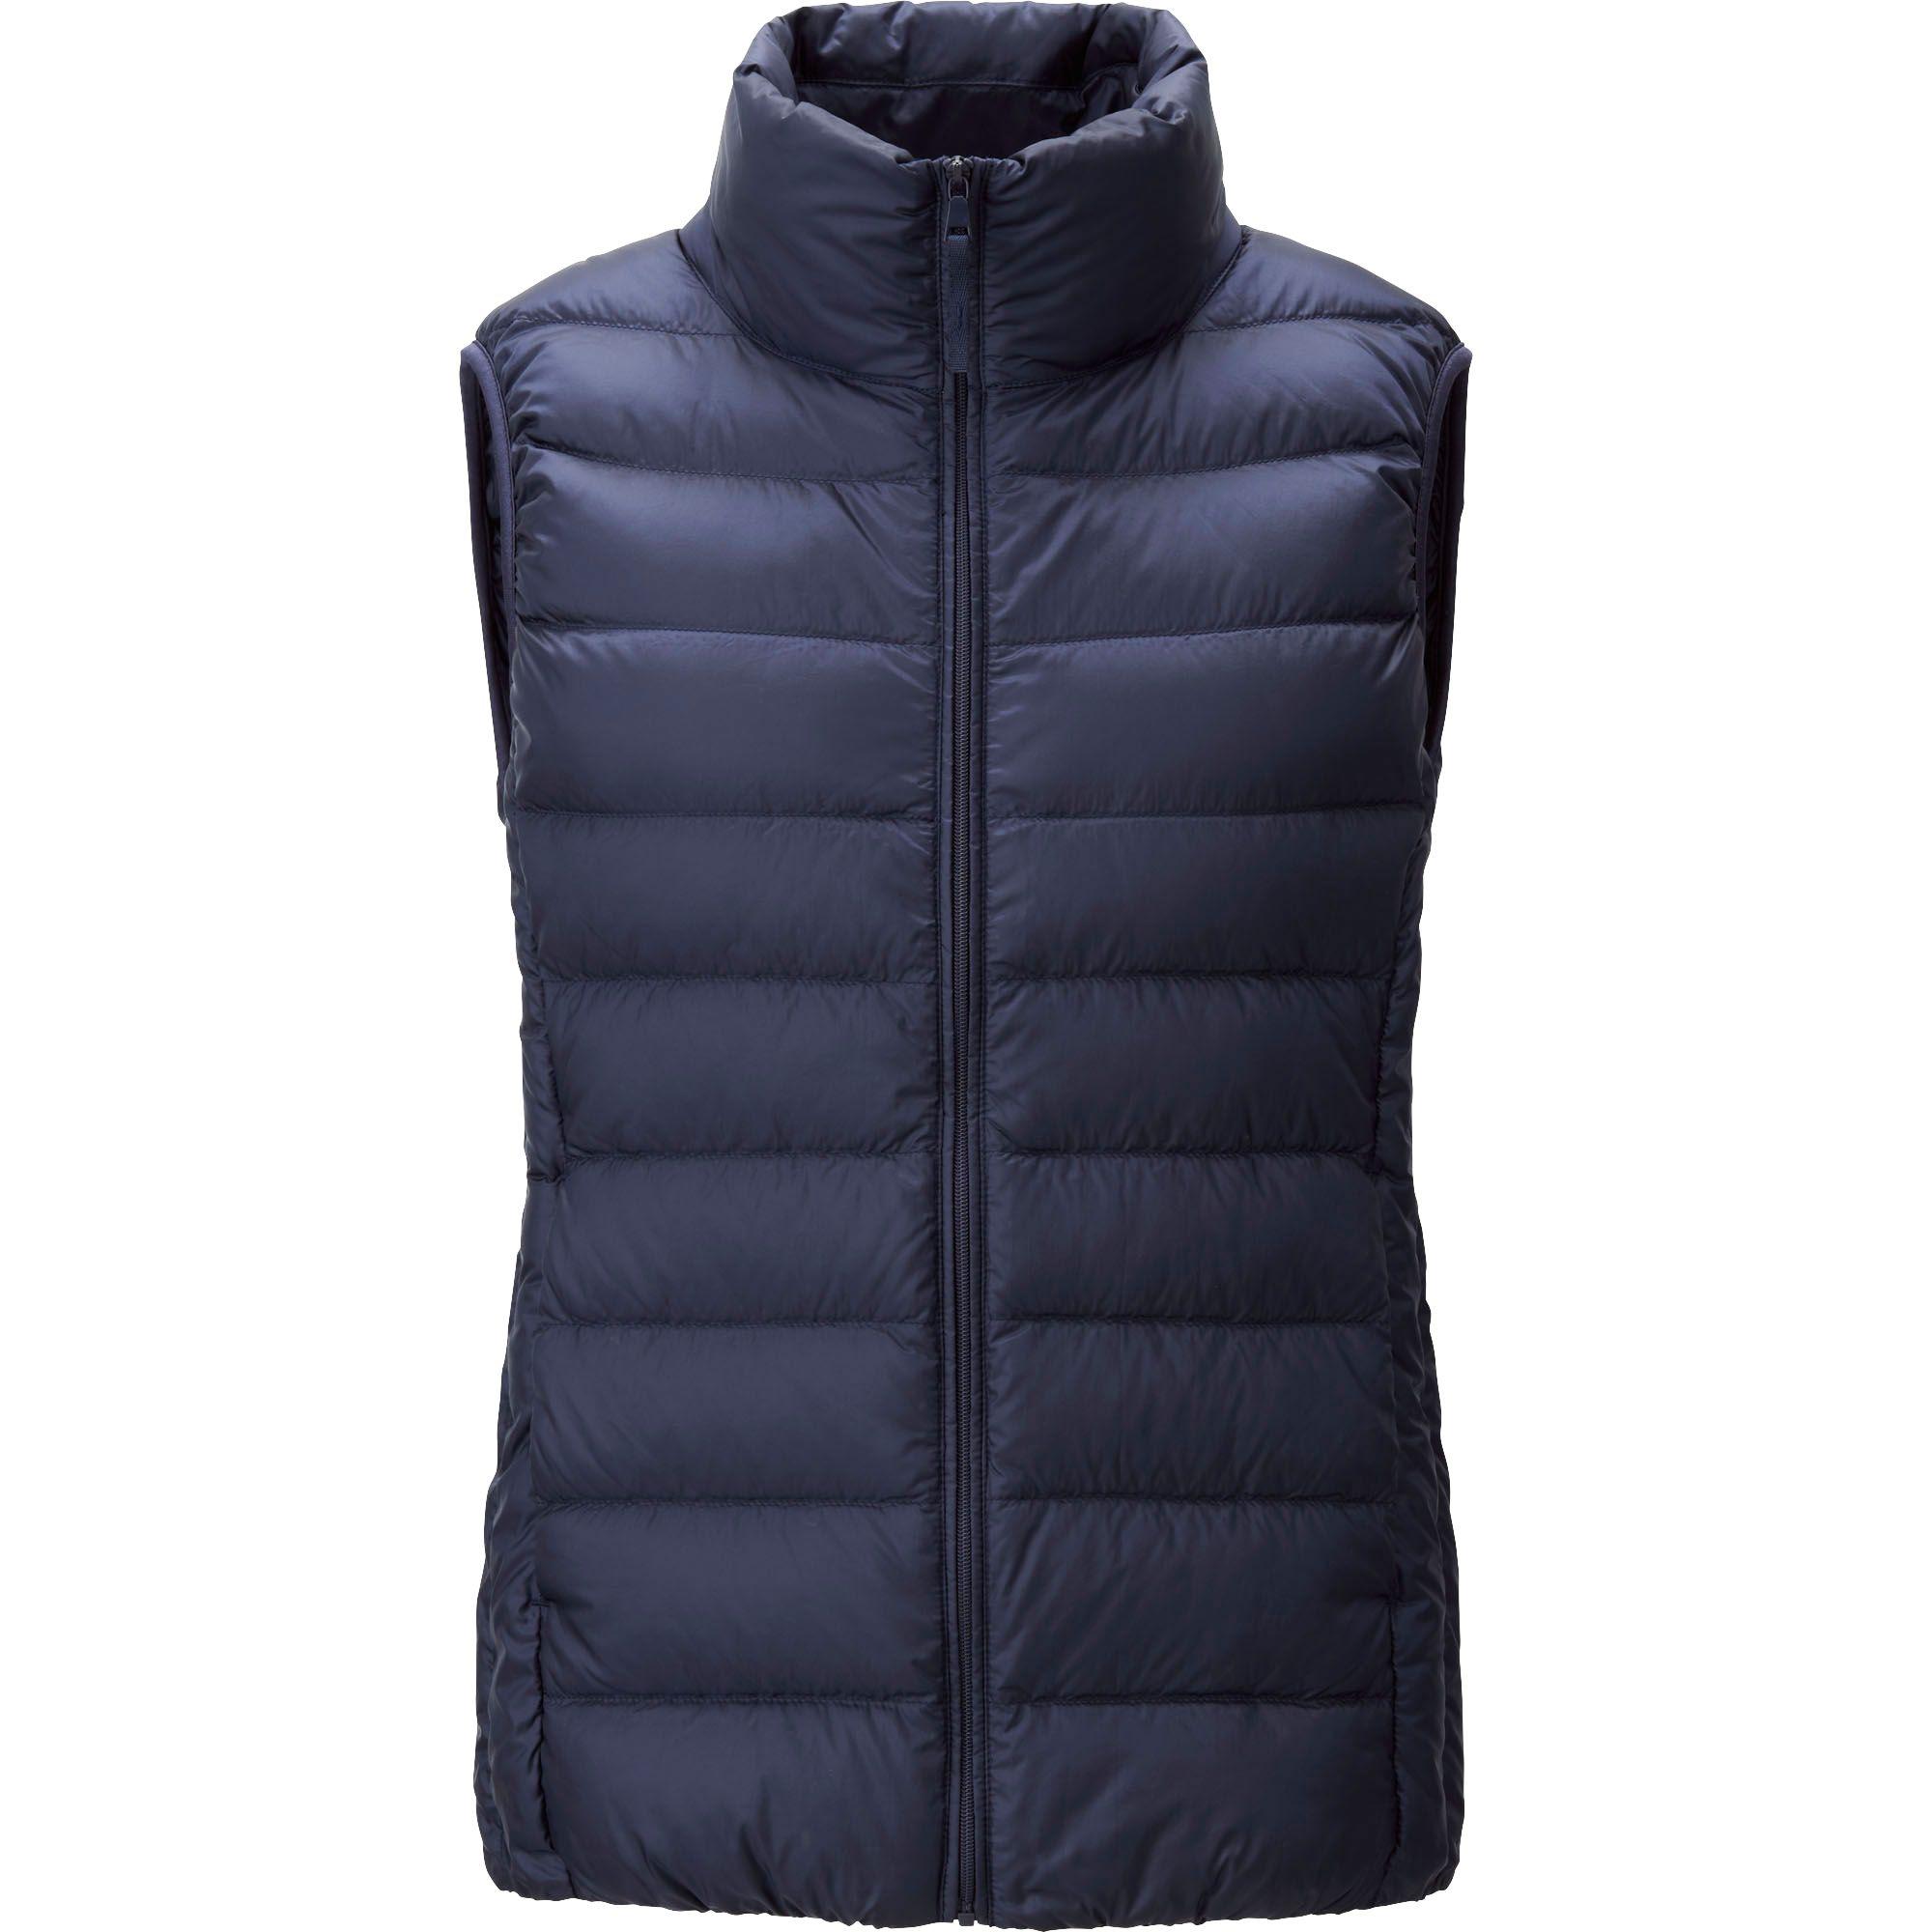 uniqlo ultra light down vest in blue navy lyst. Black Bedroom Furniture Sets. Home Design Ideas